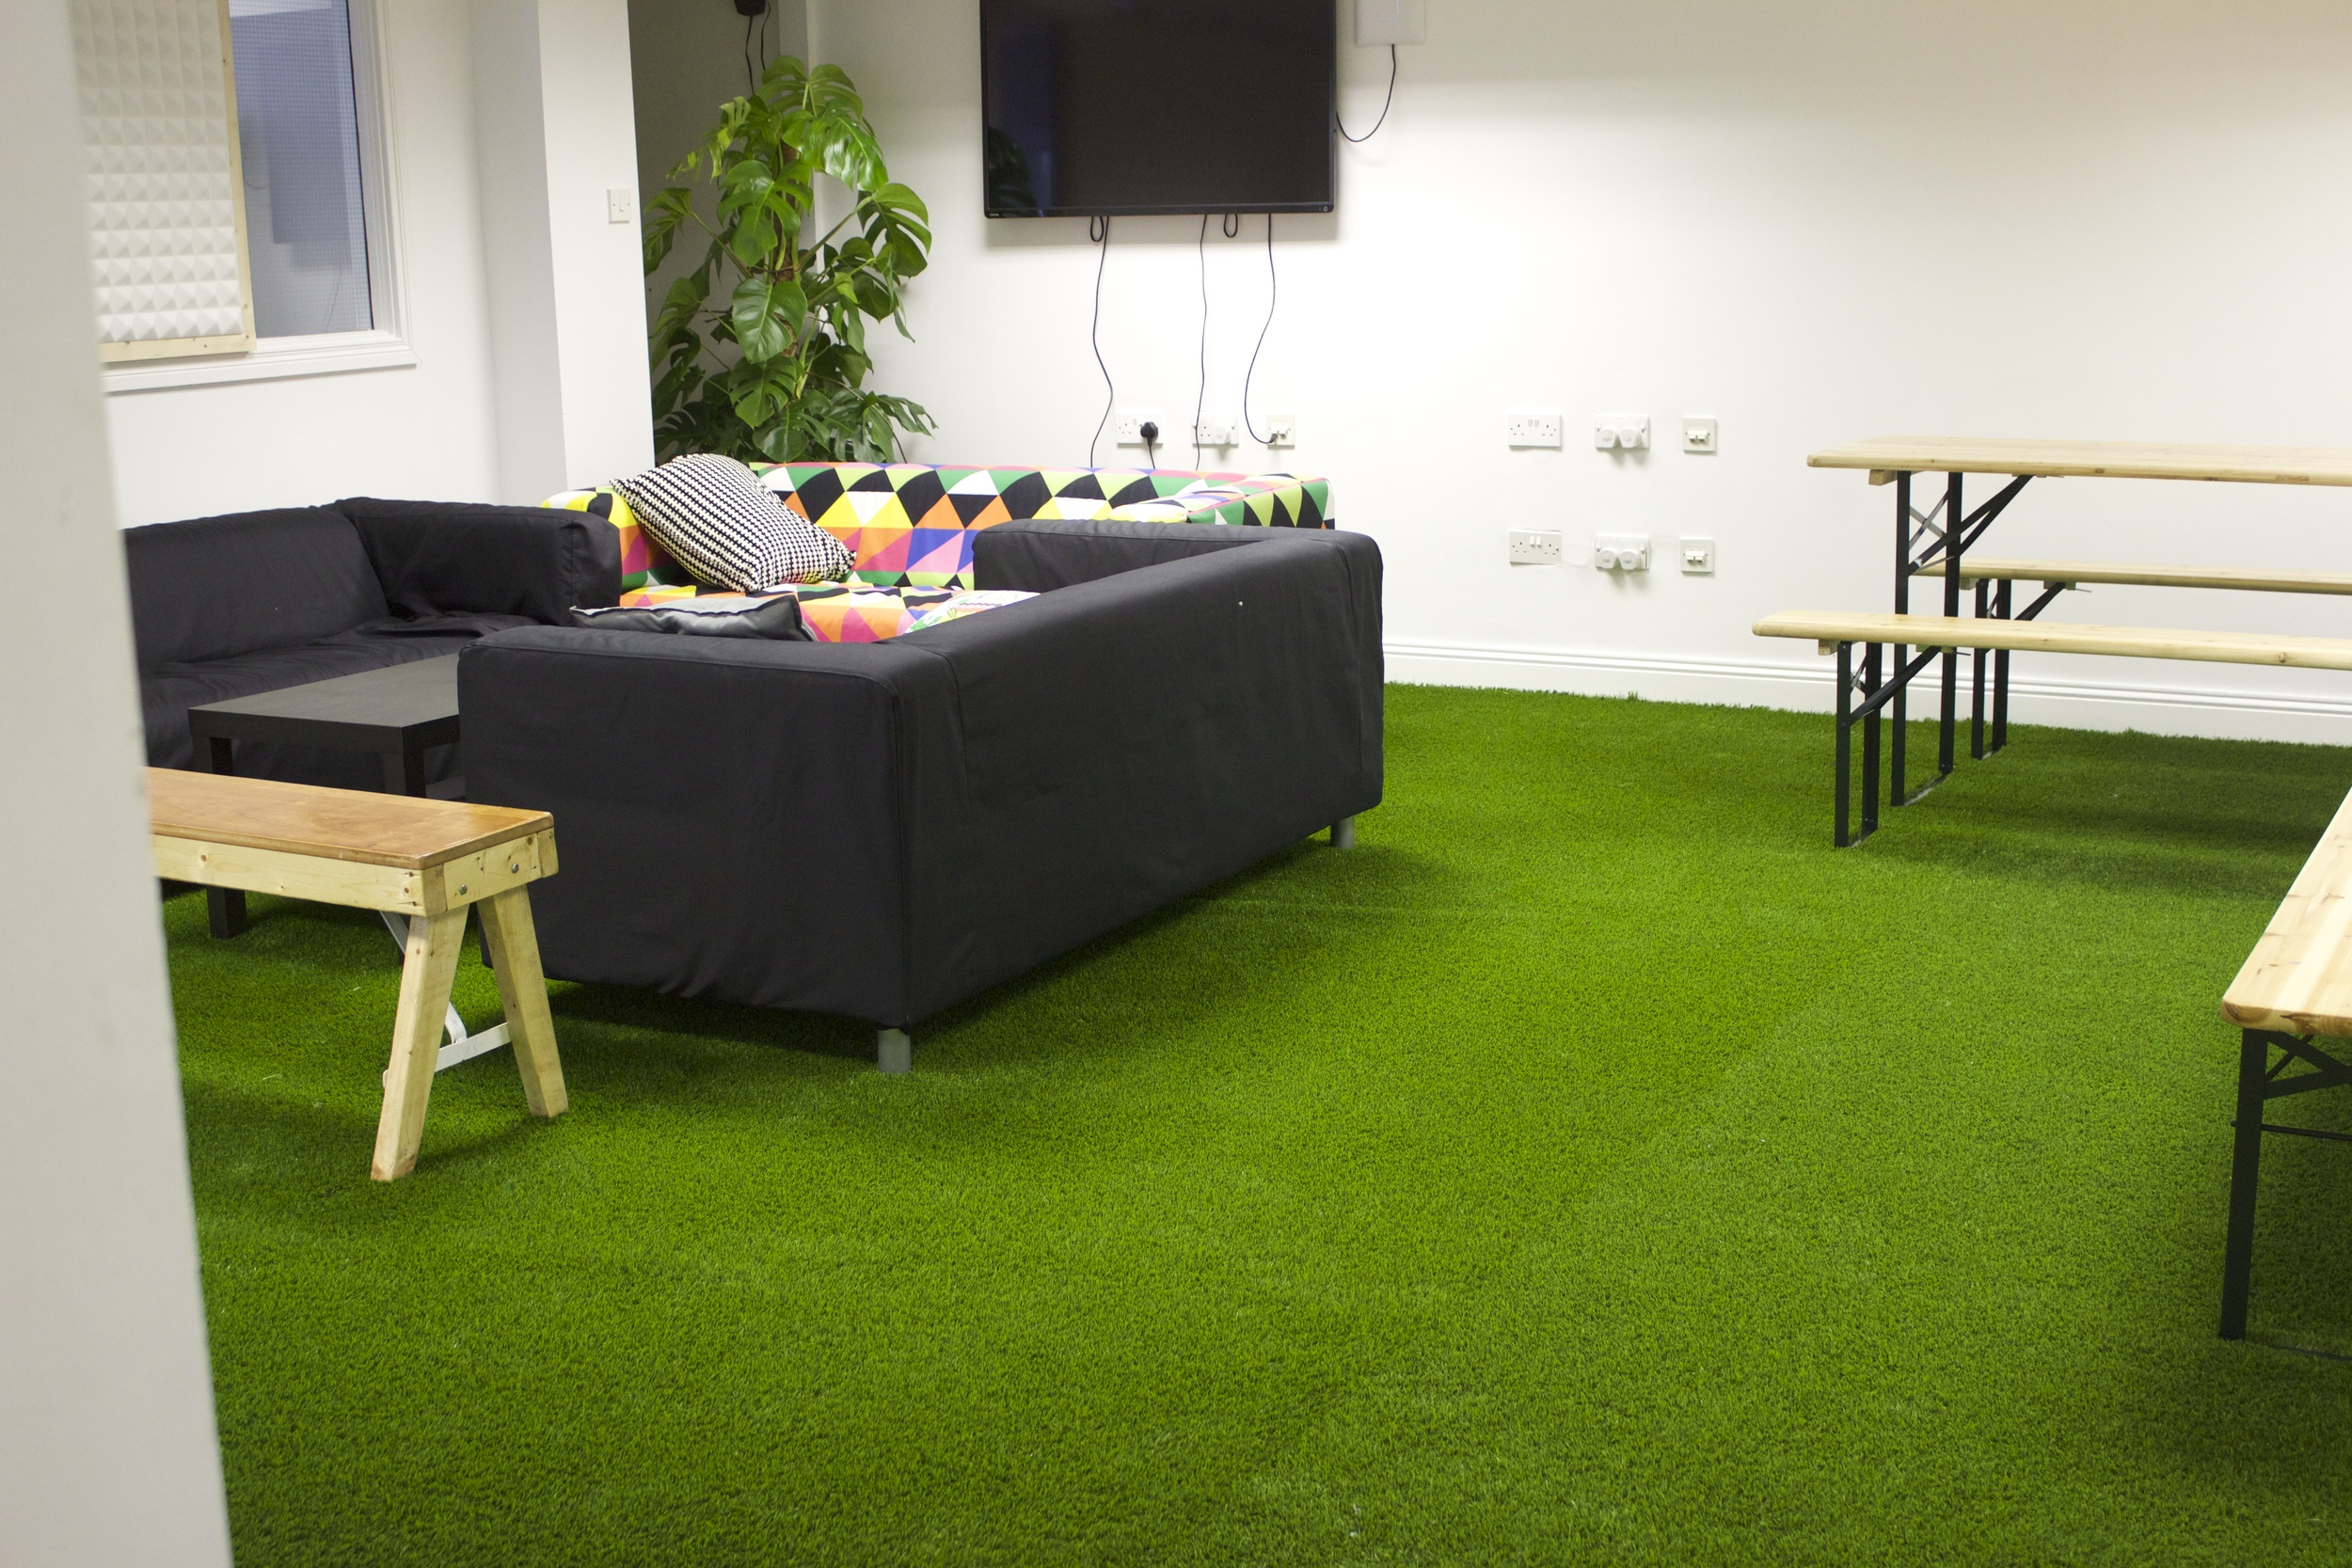 sofa green.jpg